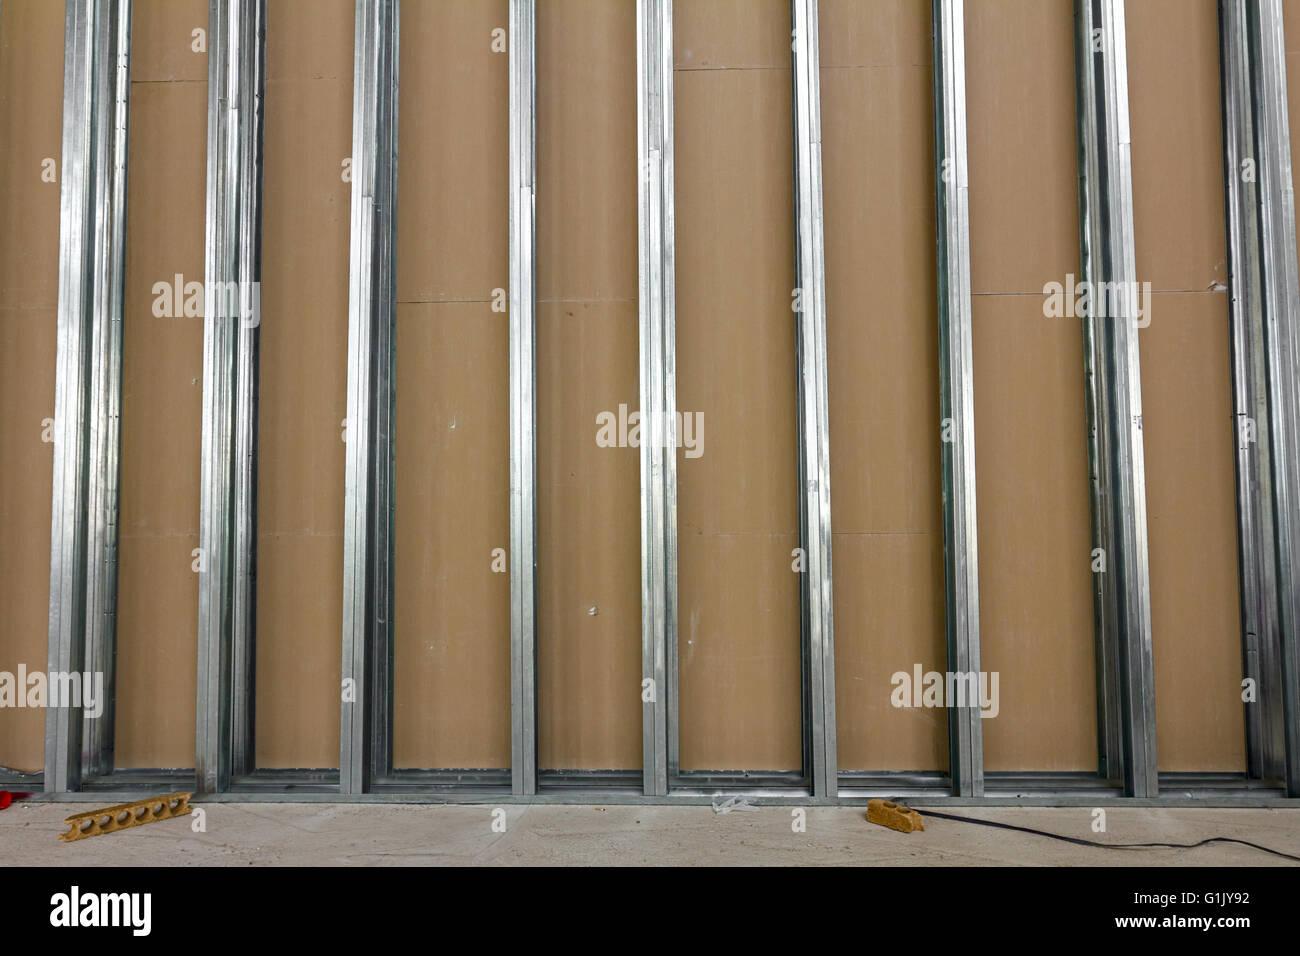 Stud Wall Frame Stock Photos & Stud Wall Frame Stock Images - Alamy